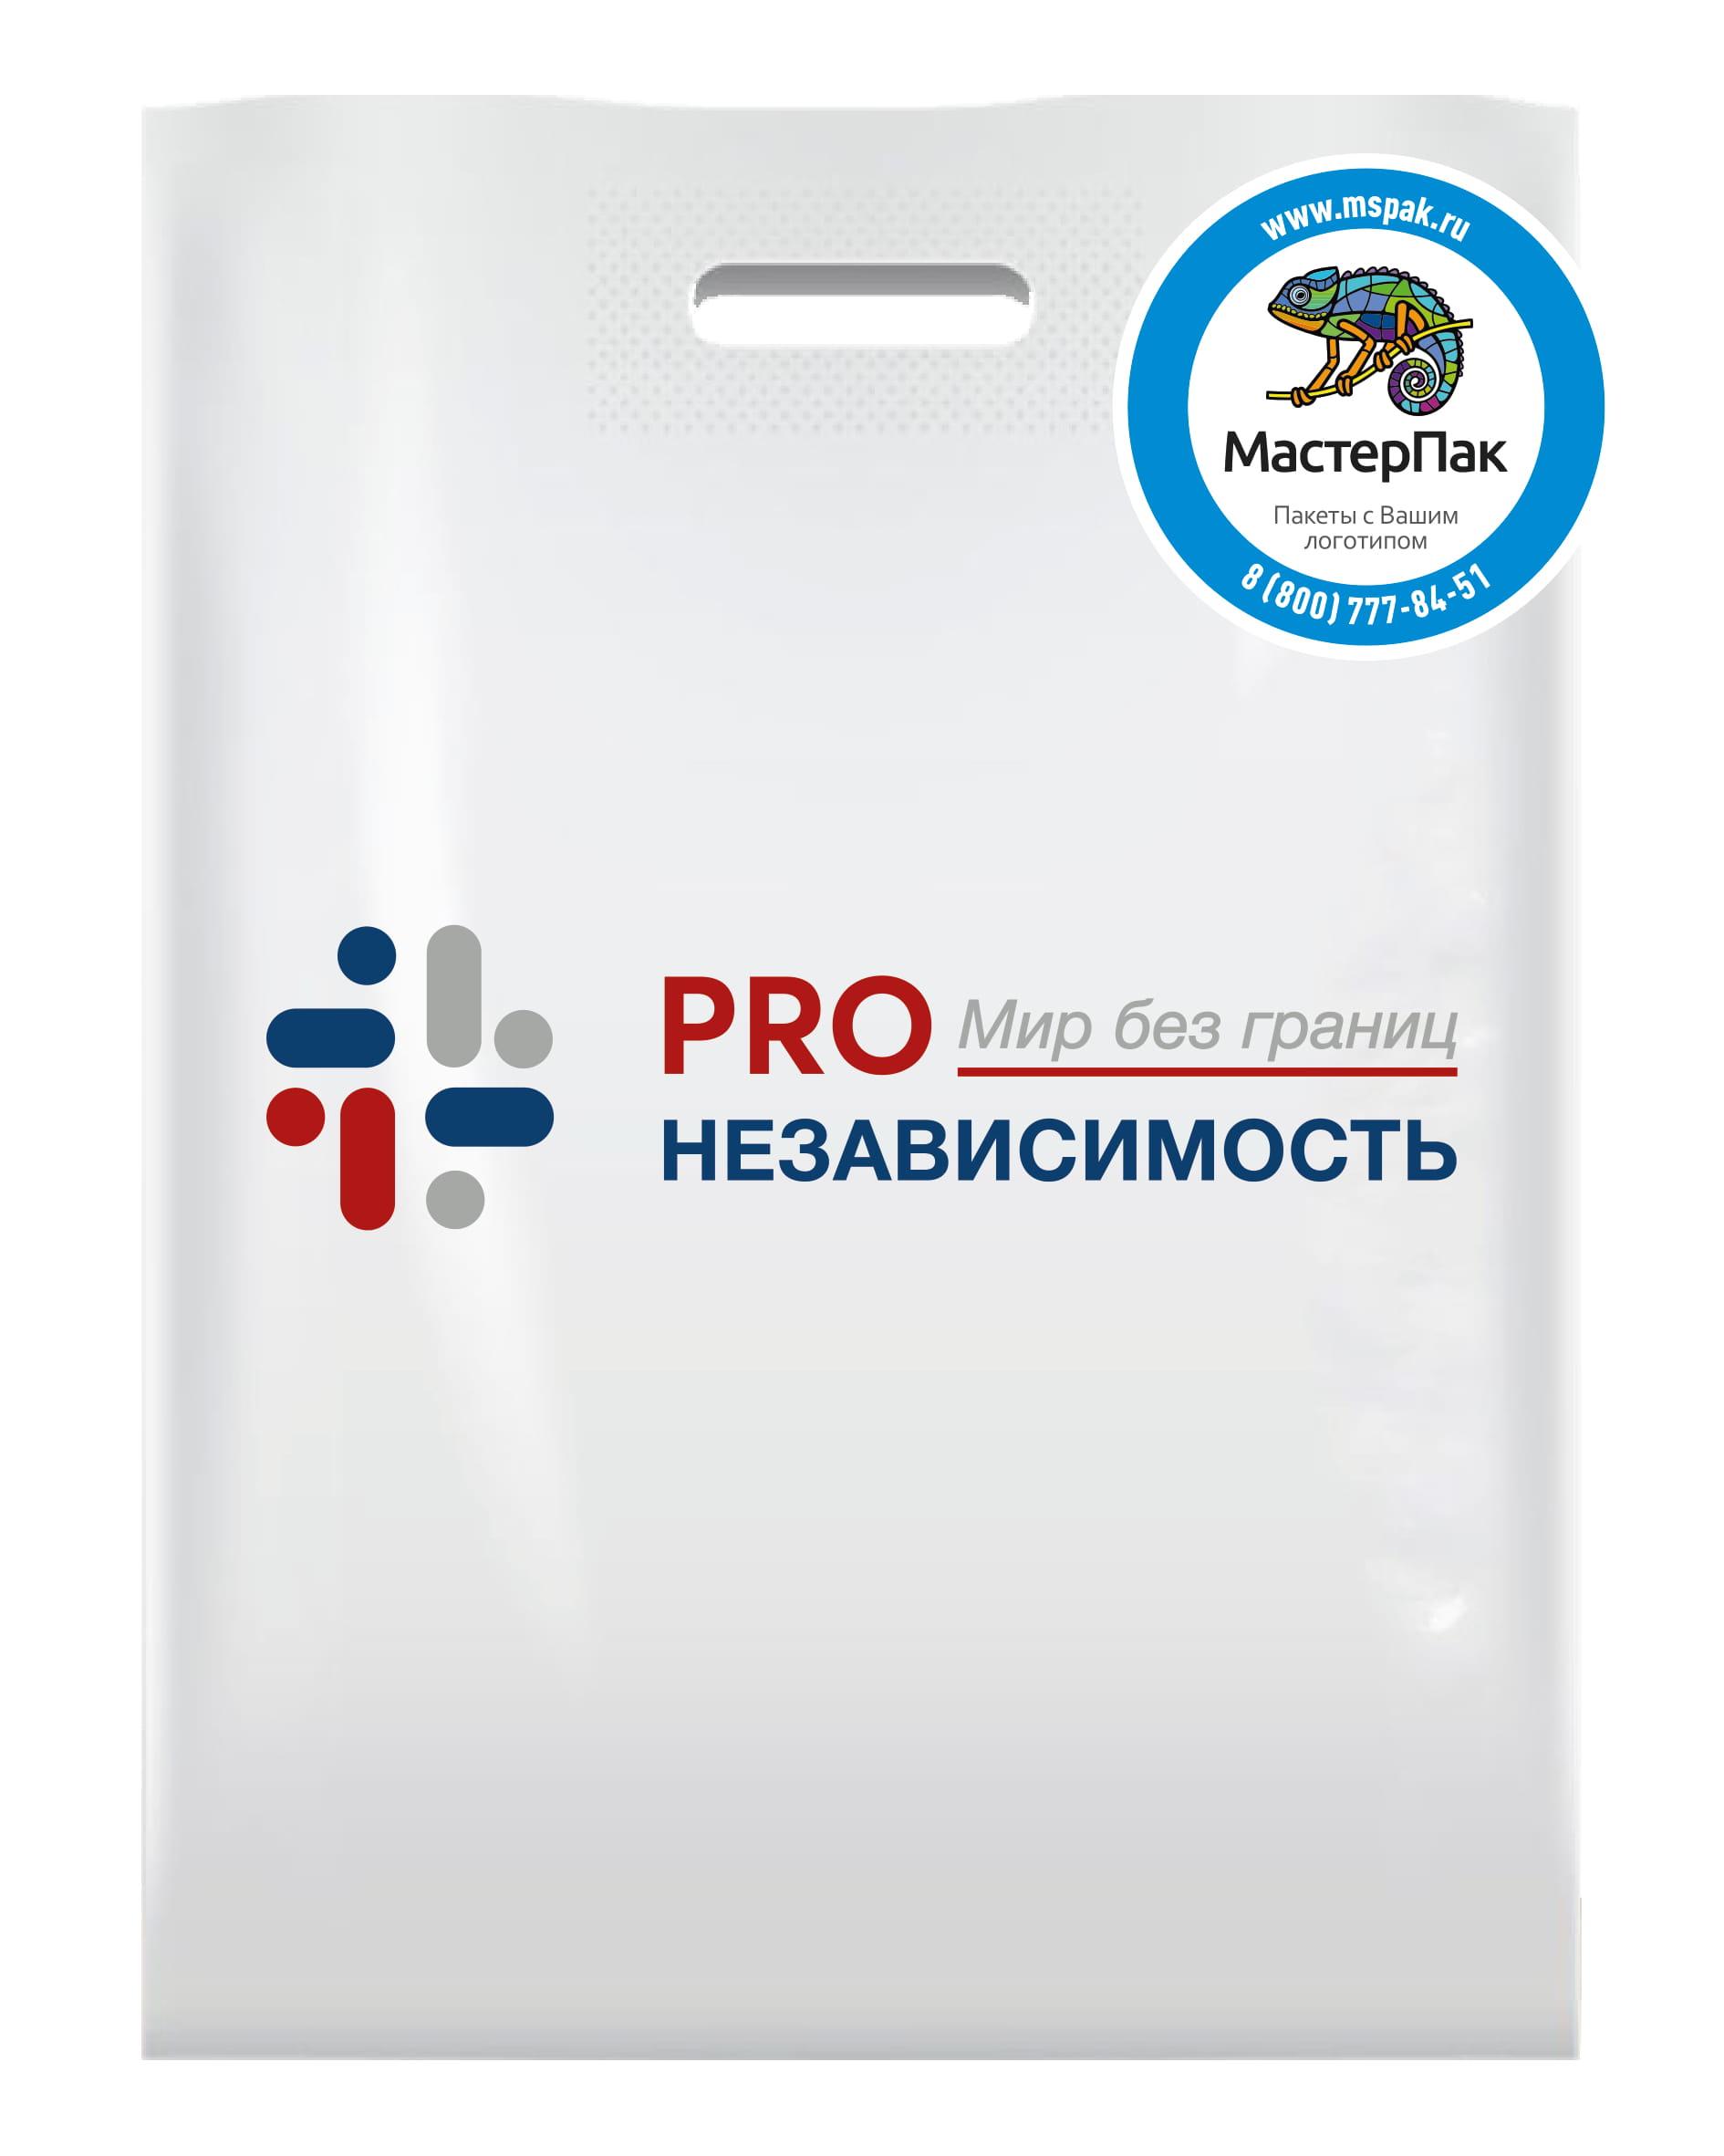 Пакет ПВД с логотипом PRO Независимость, Москва, 30*40 см, 70 мкм